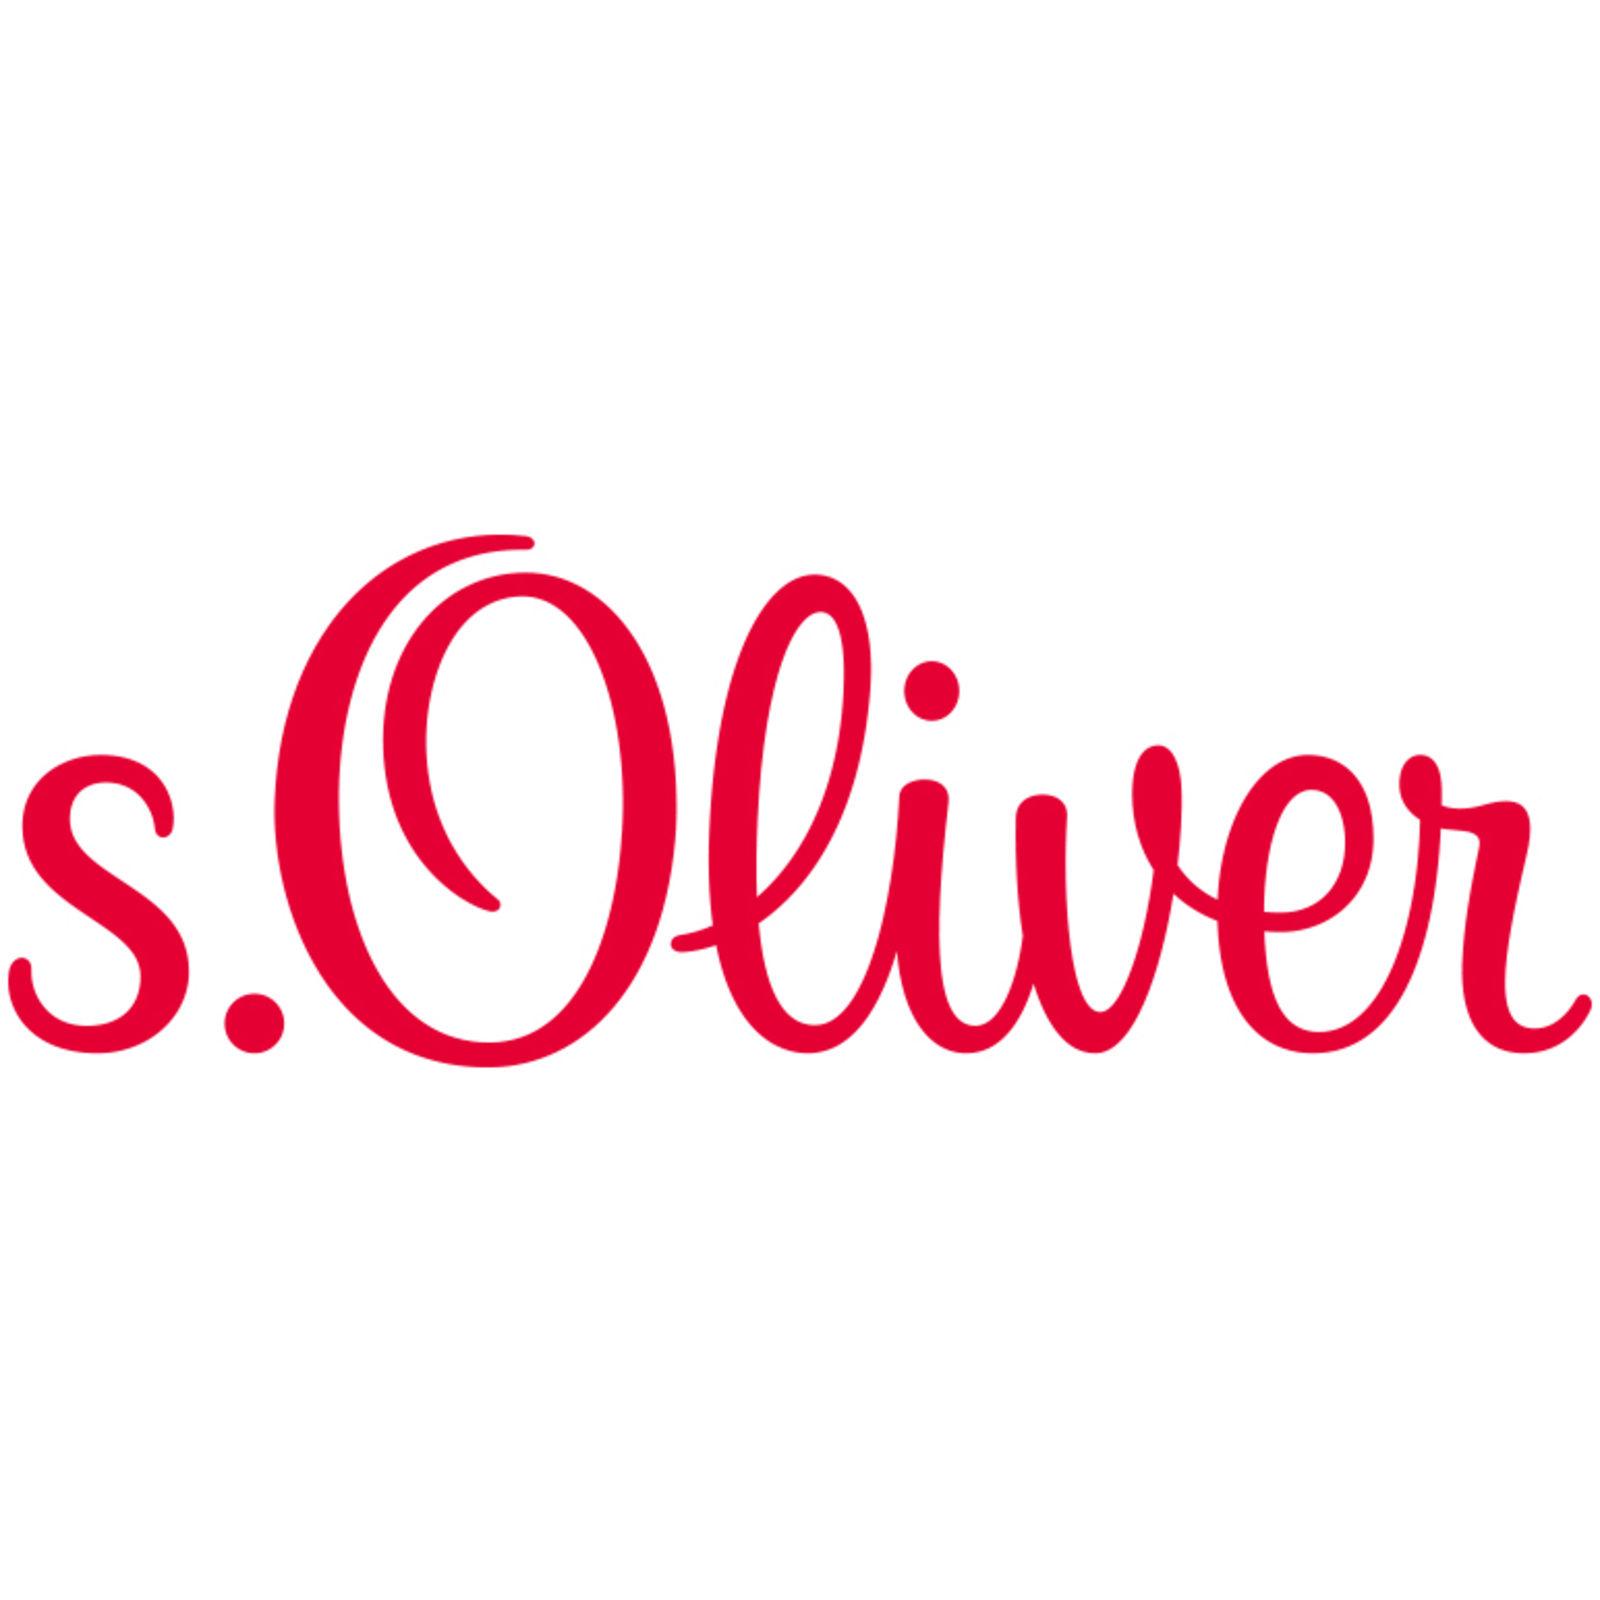 s.Oliver (Bild 1)